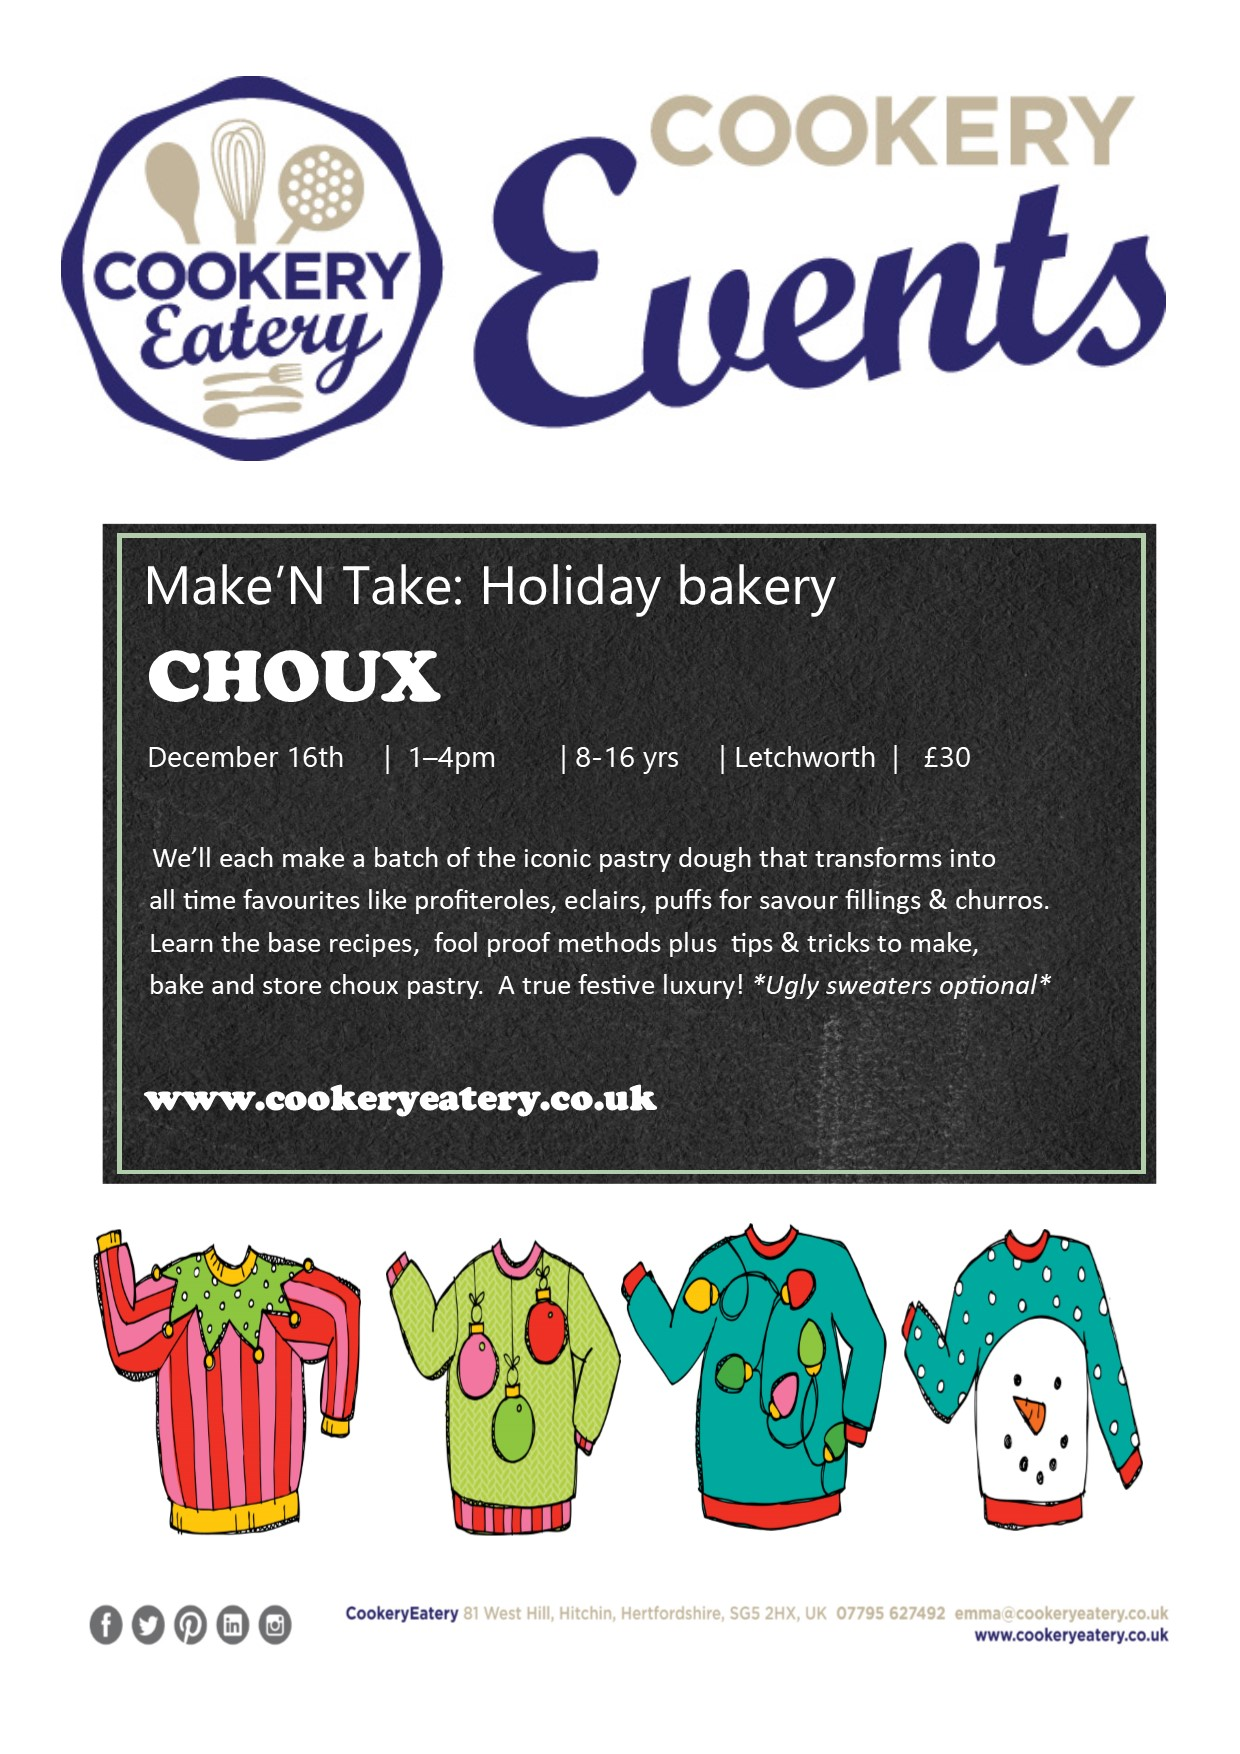 CookeryEatery.MAKE N TAKE. Holiday Bakery.CHOUX.Dec17.jpg